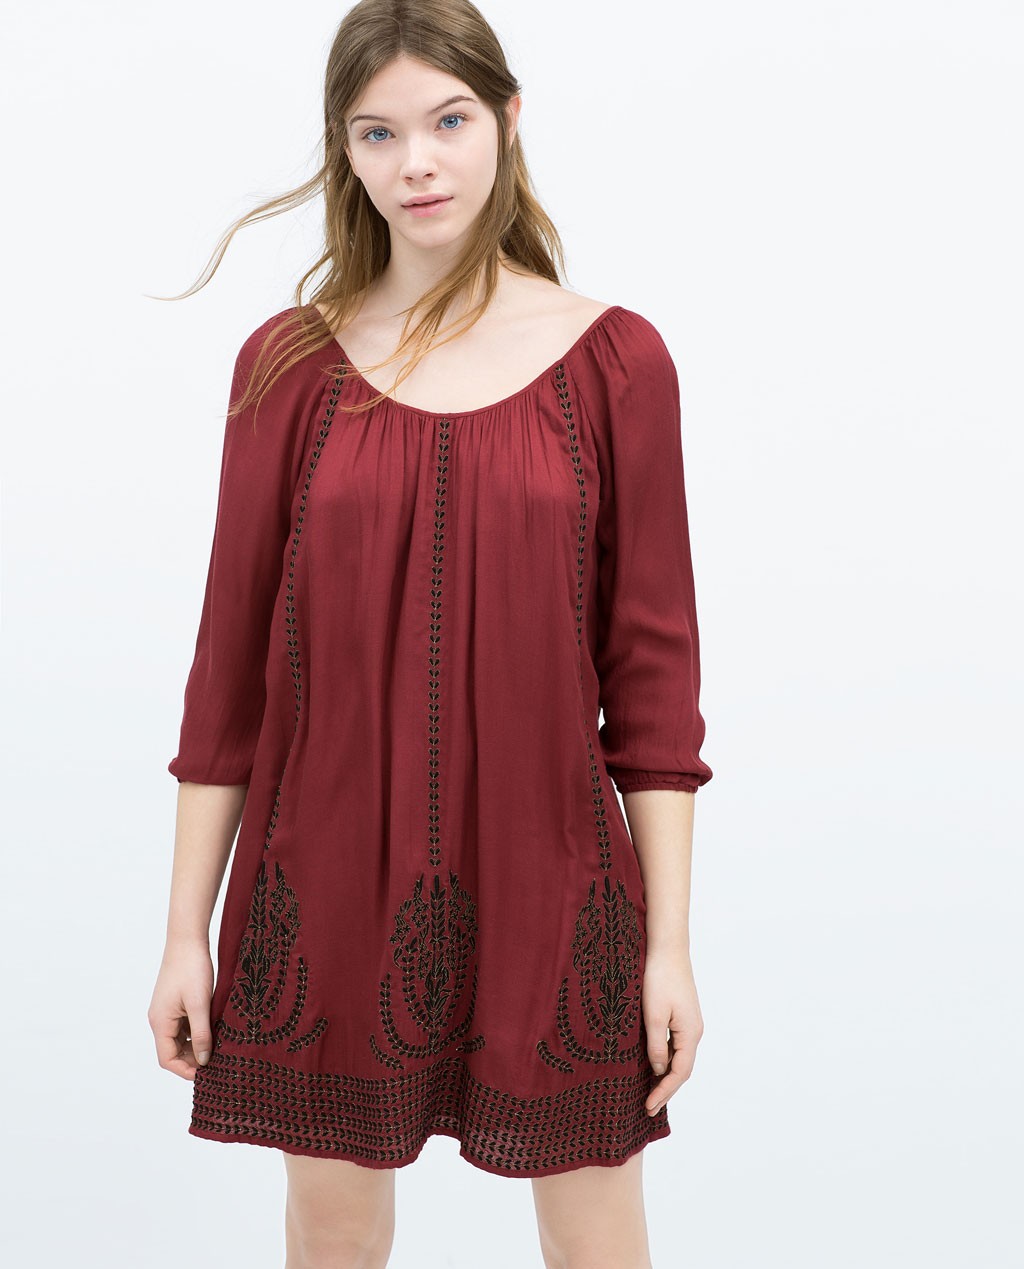 embroidered dress zara.jpg